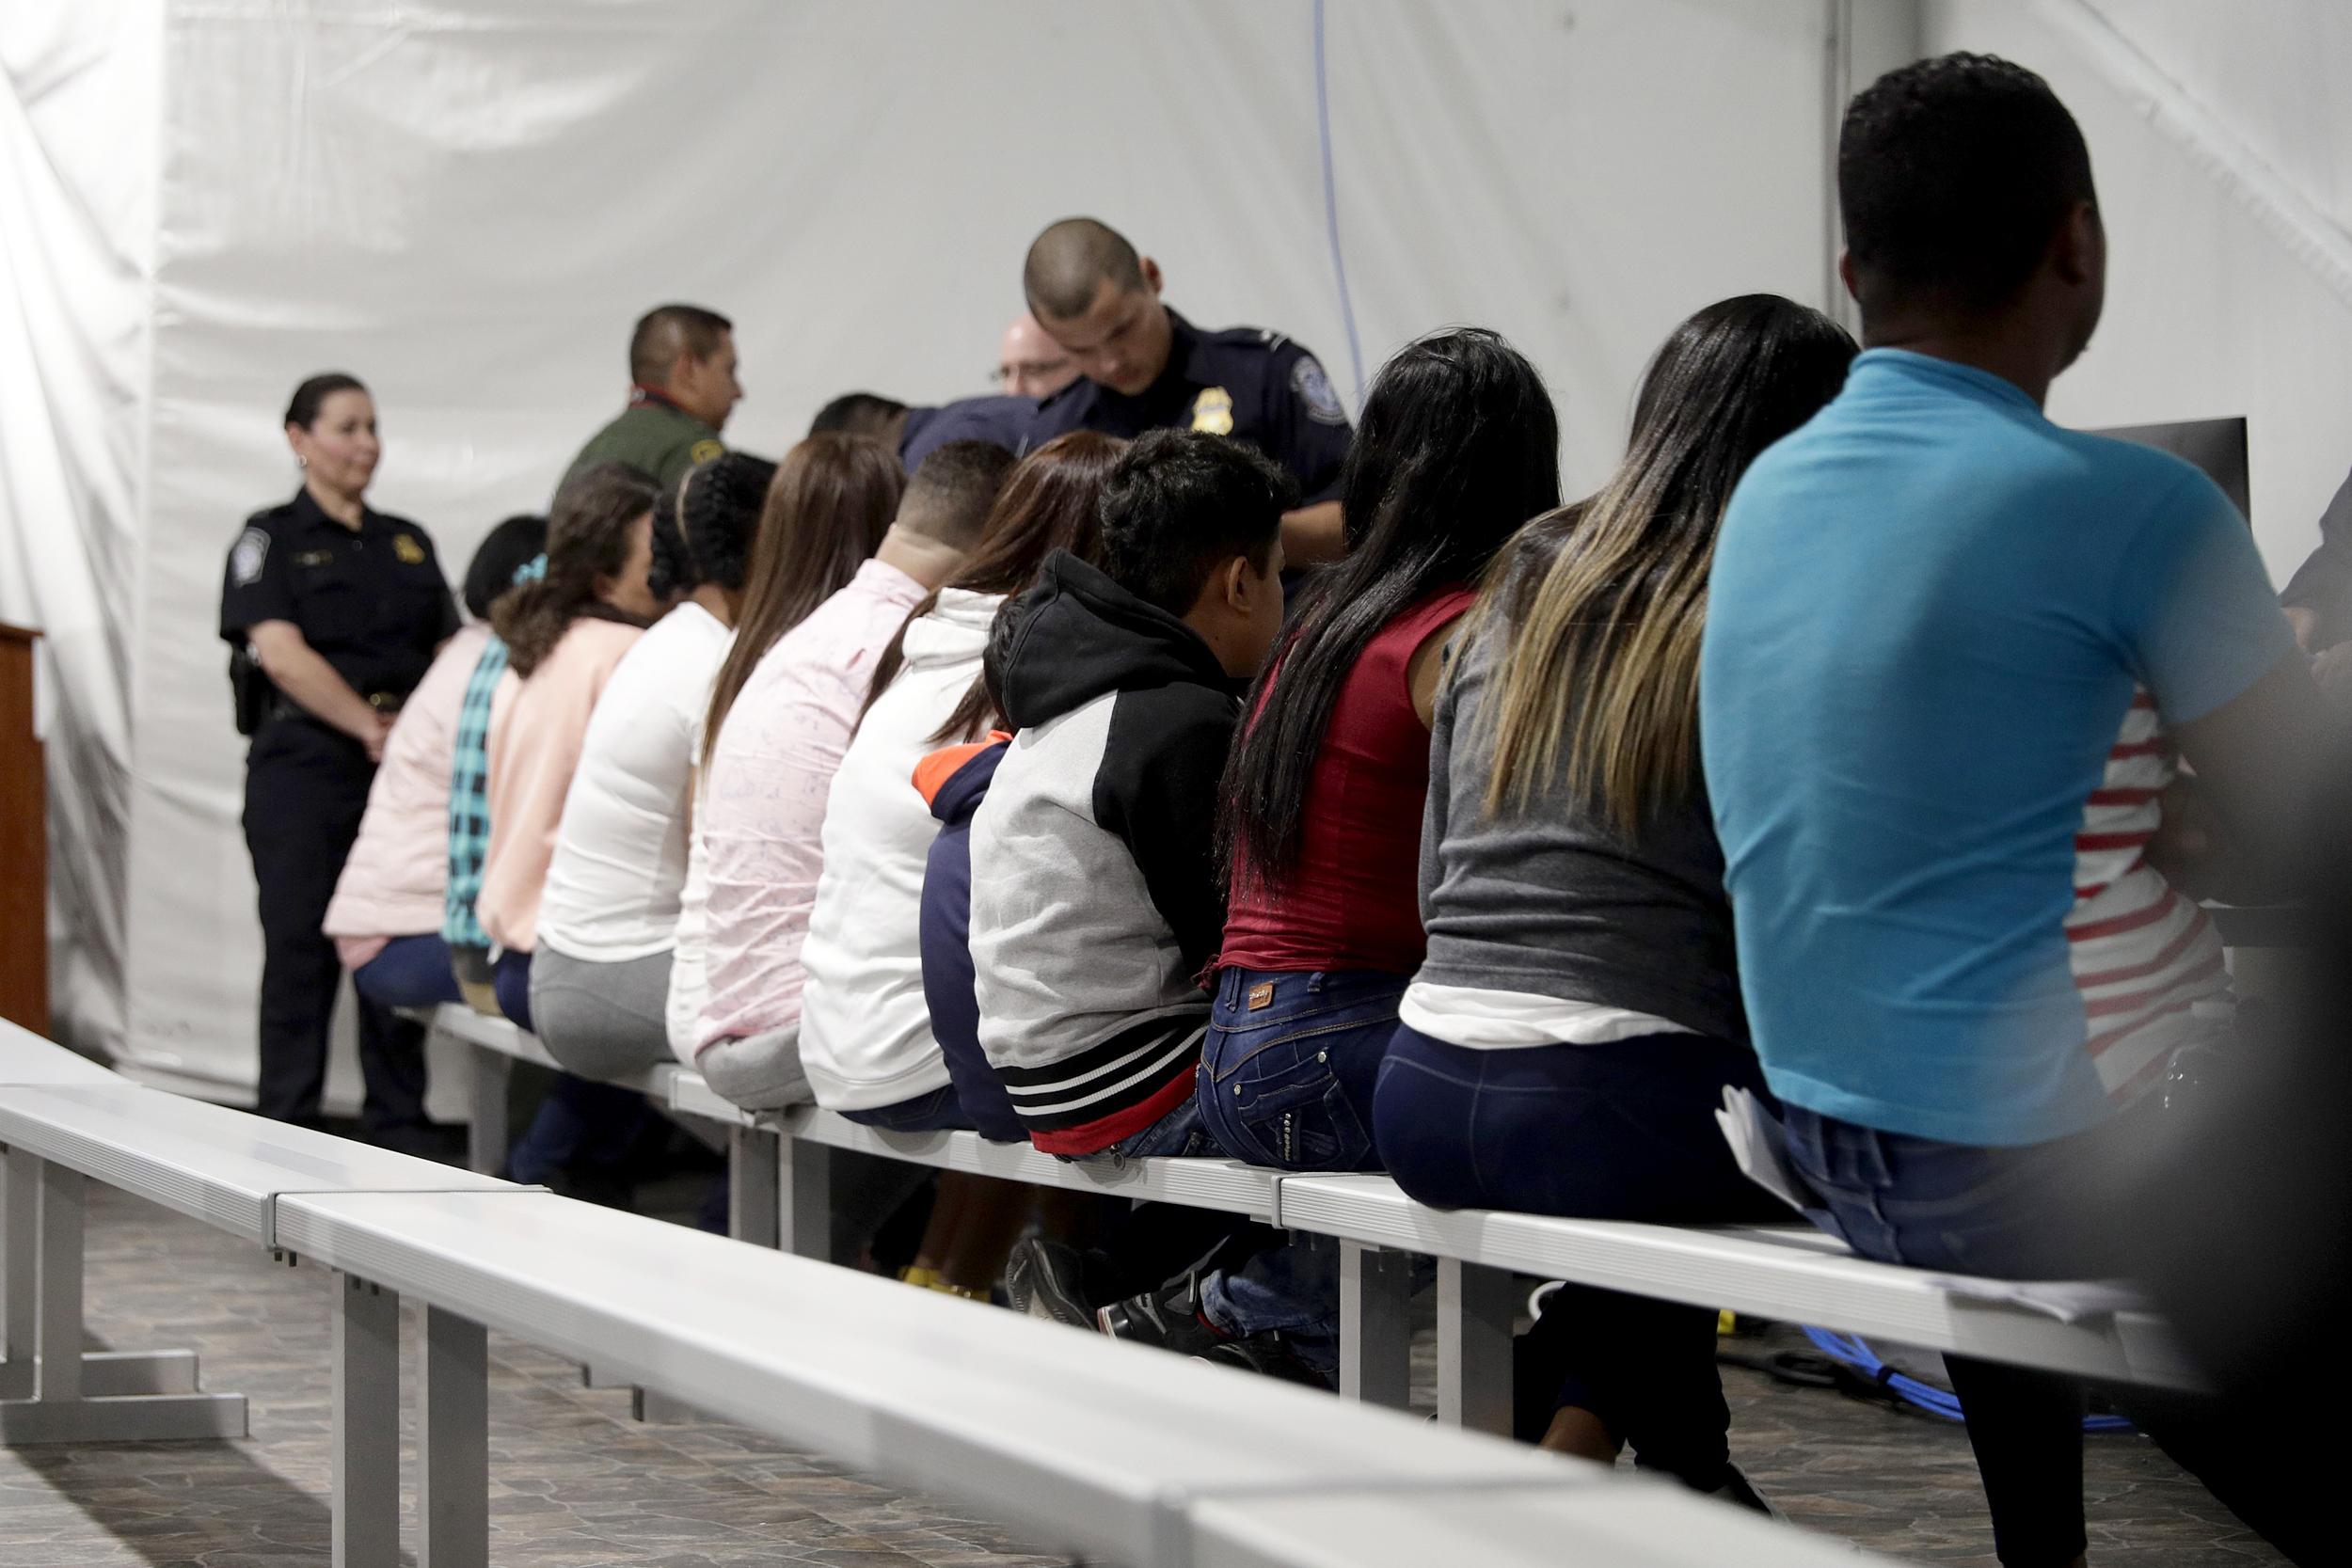 210611-migrants-asylum-laredo-ew-344p_cb